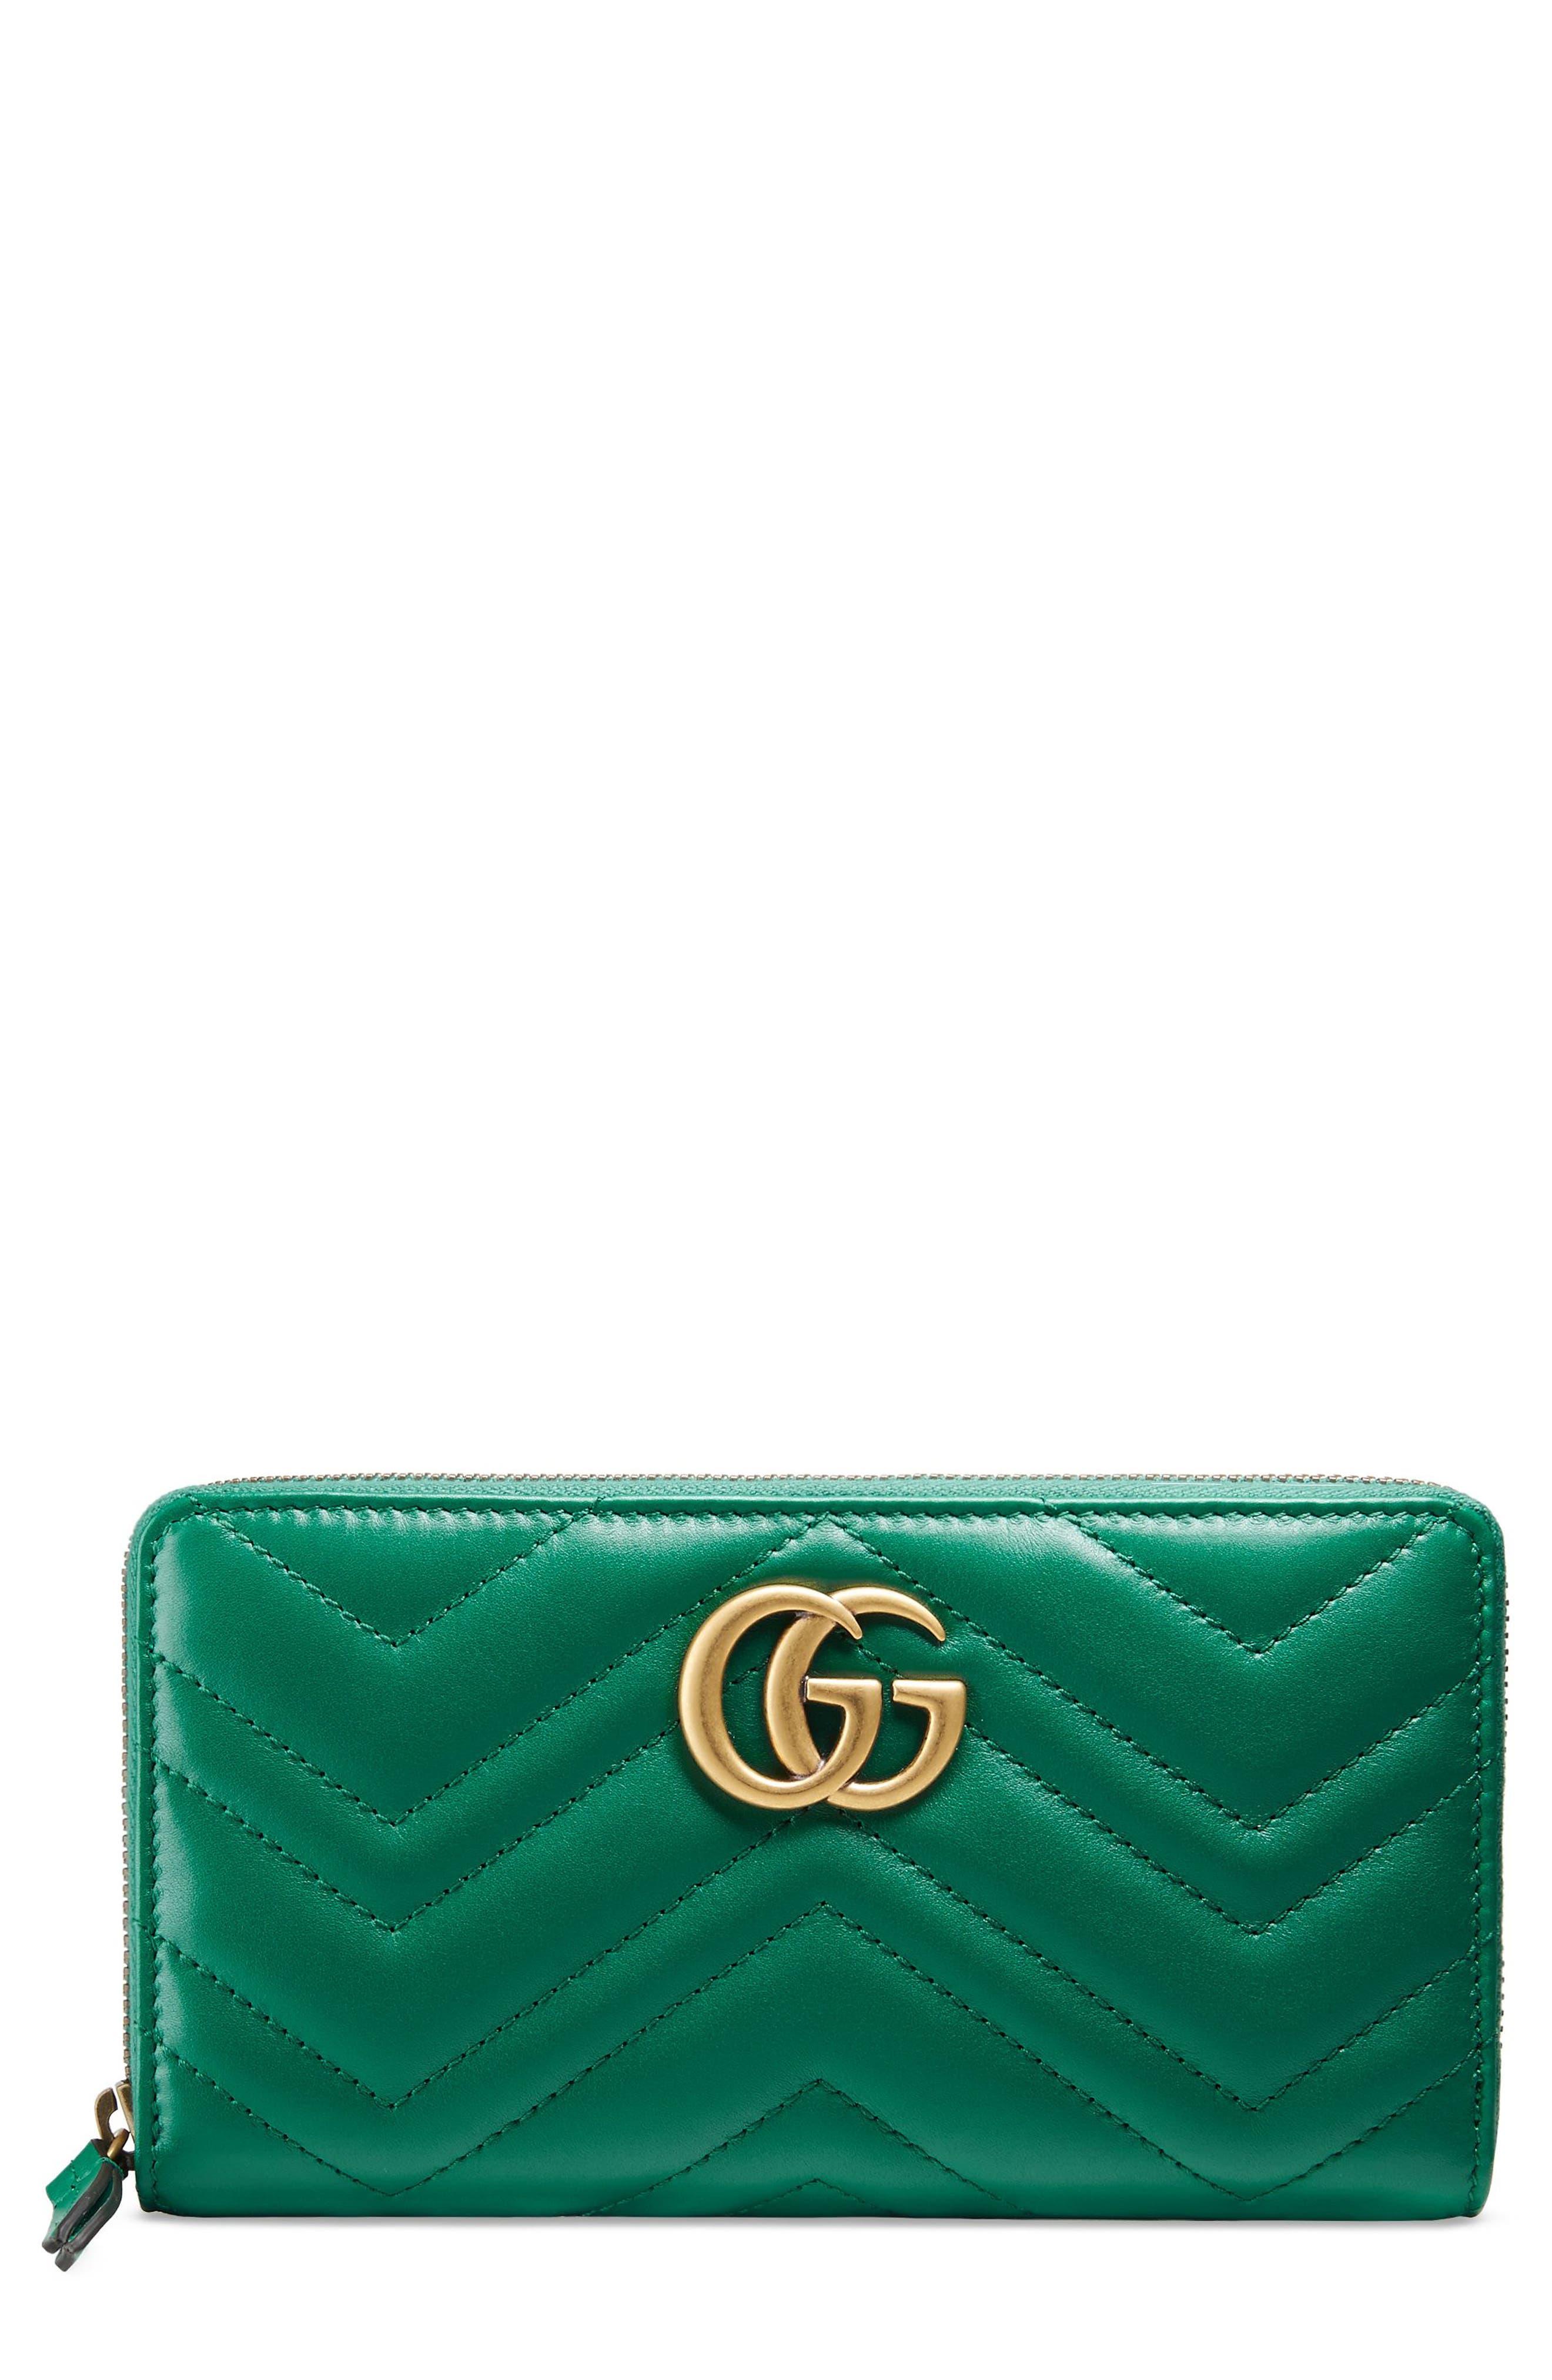 Gucci GG Marmont Matelassé Leather Zip-Around Wallet